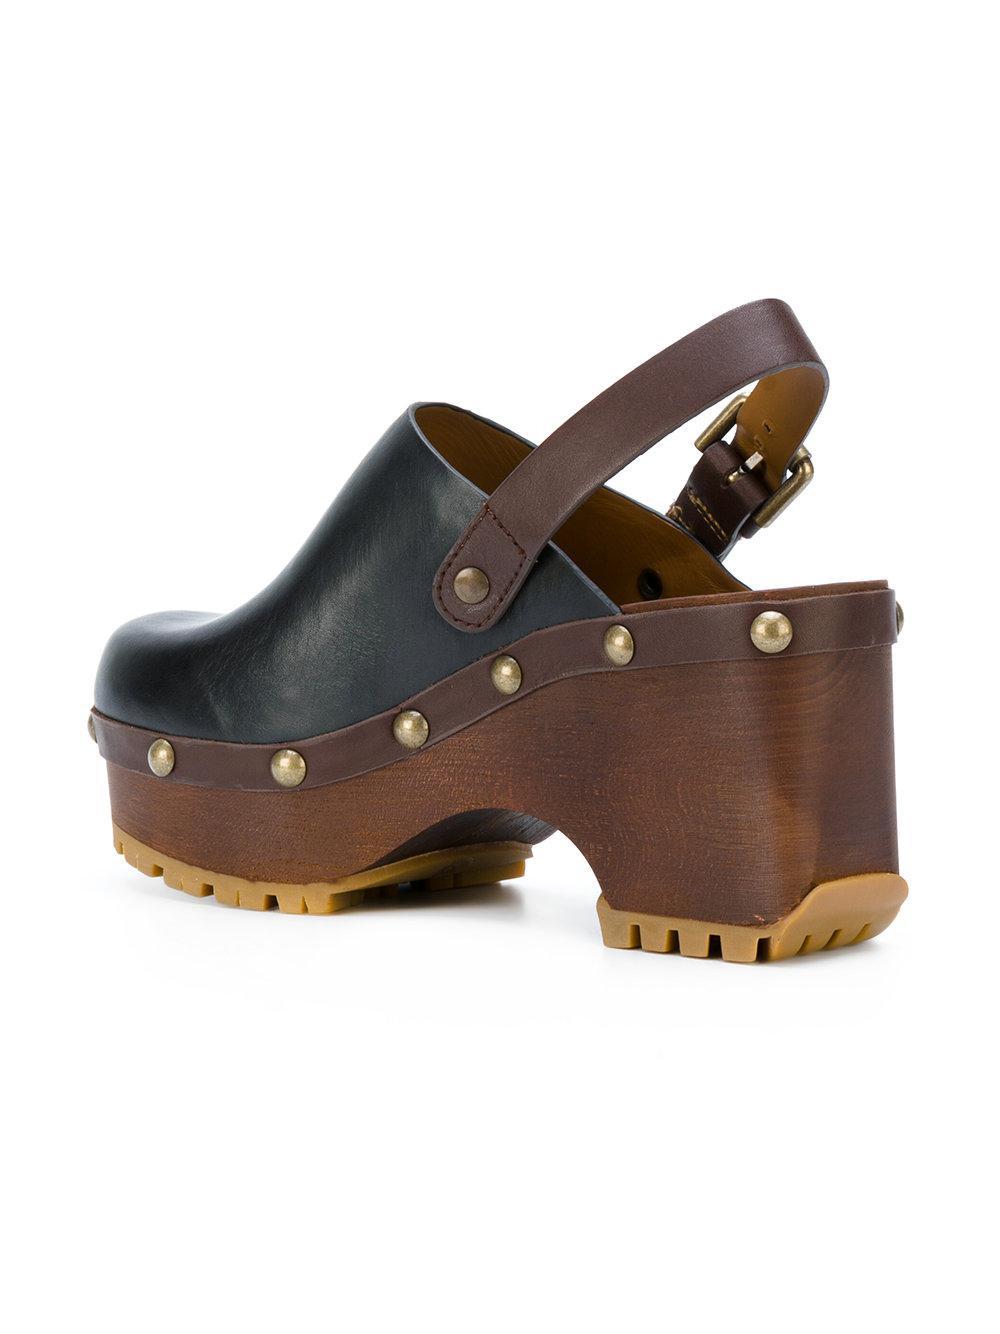 Aminah Abdul Jillil Shoes Uk